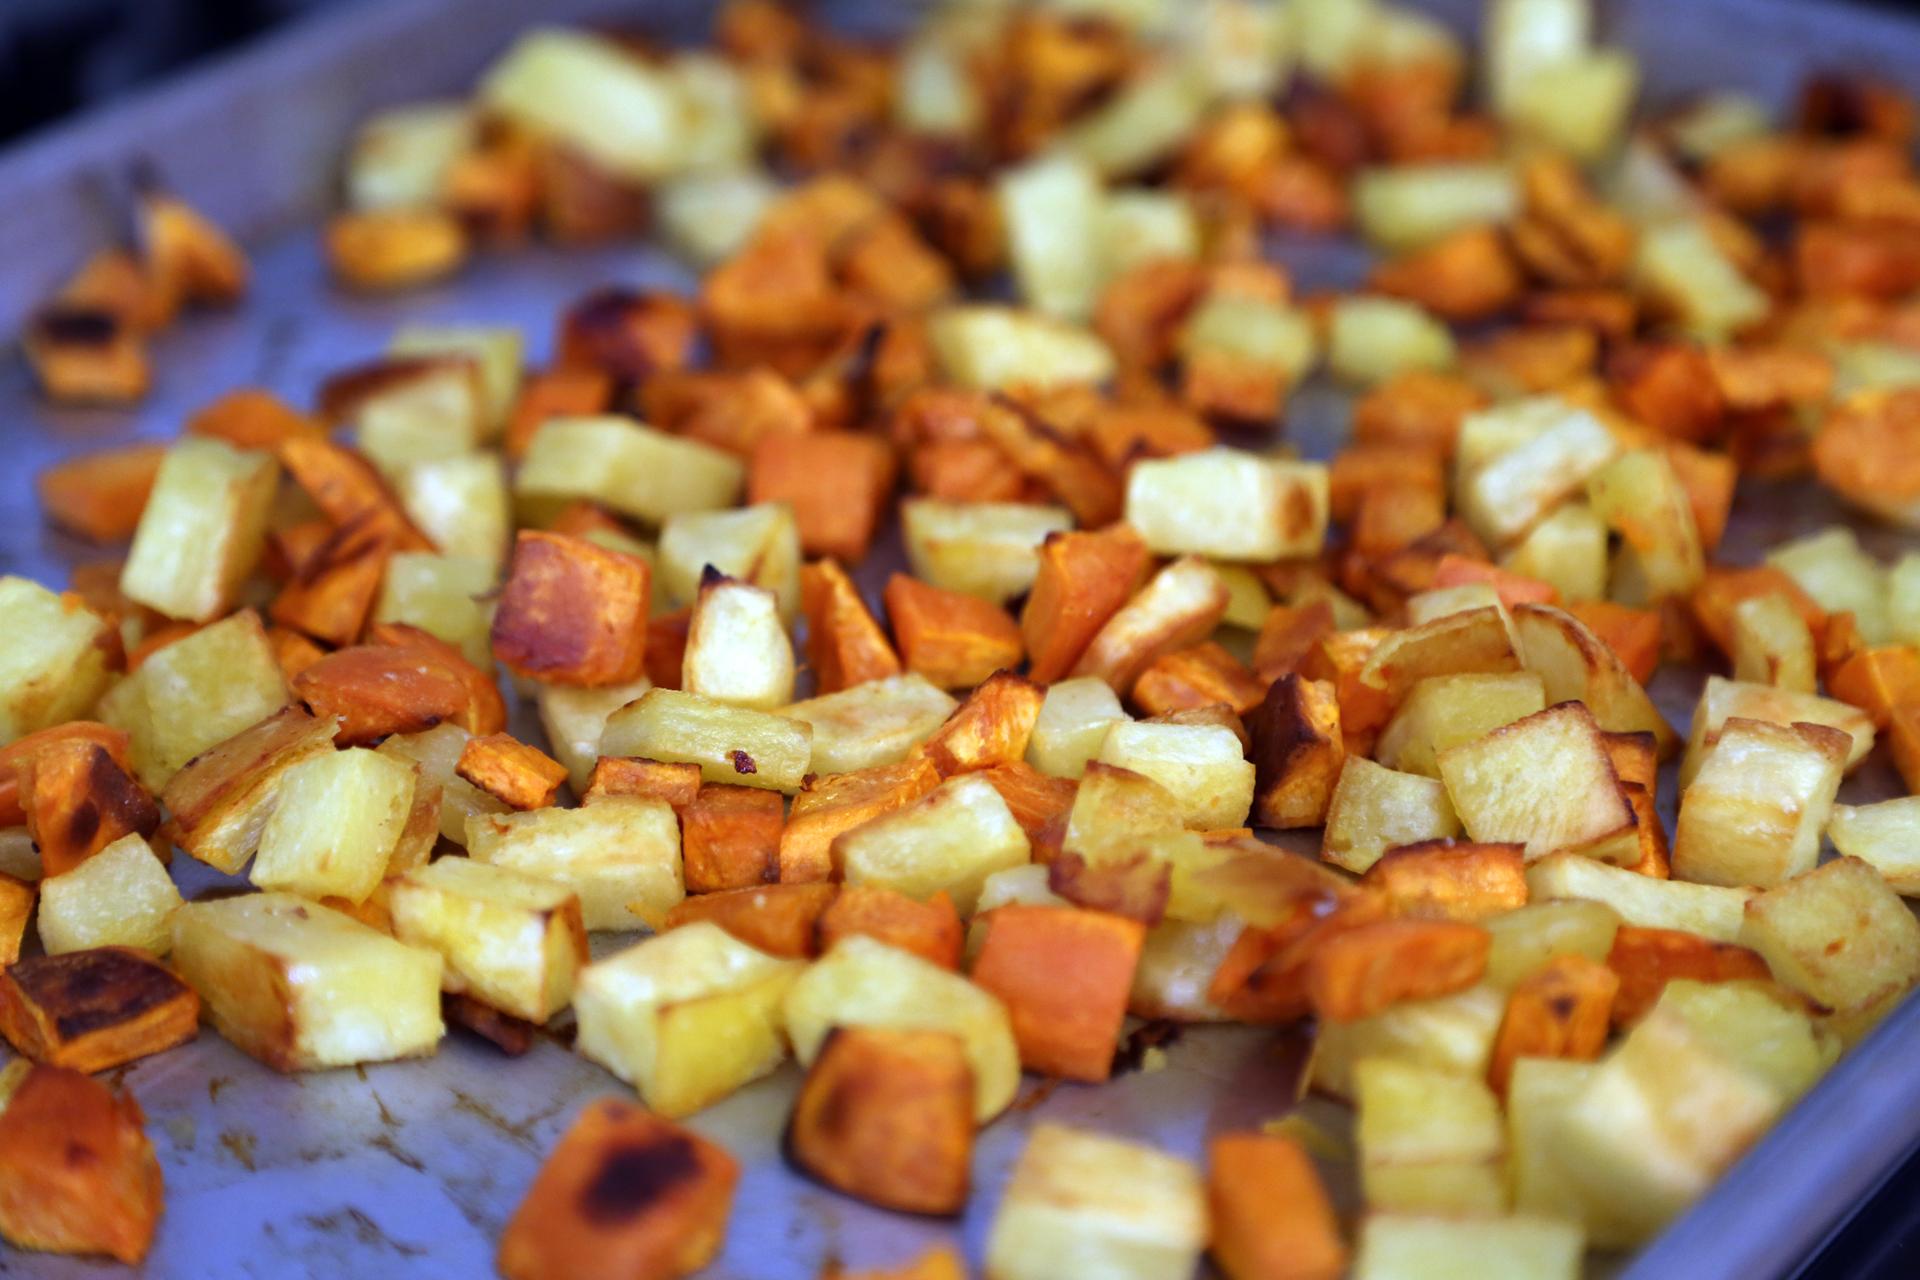 Roast the potatoes until tender and brown.